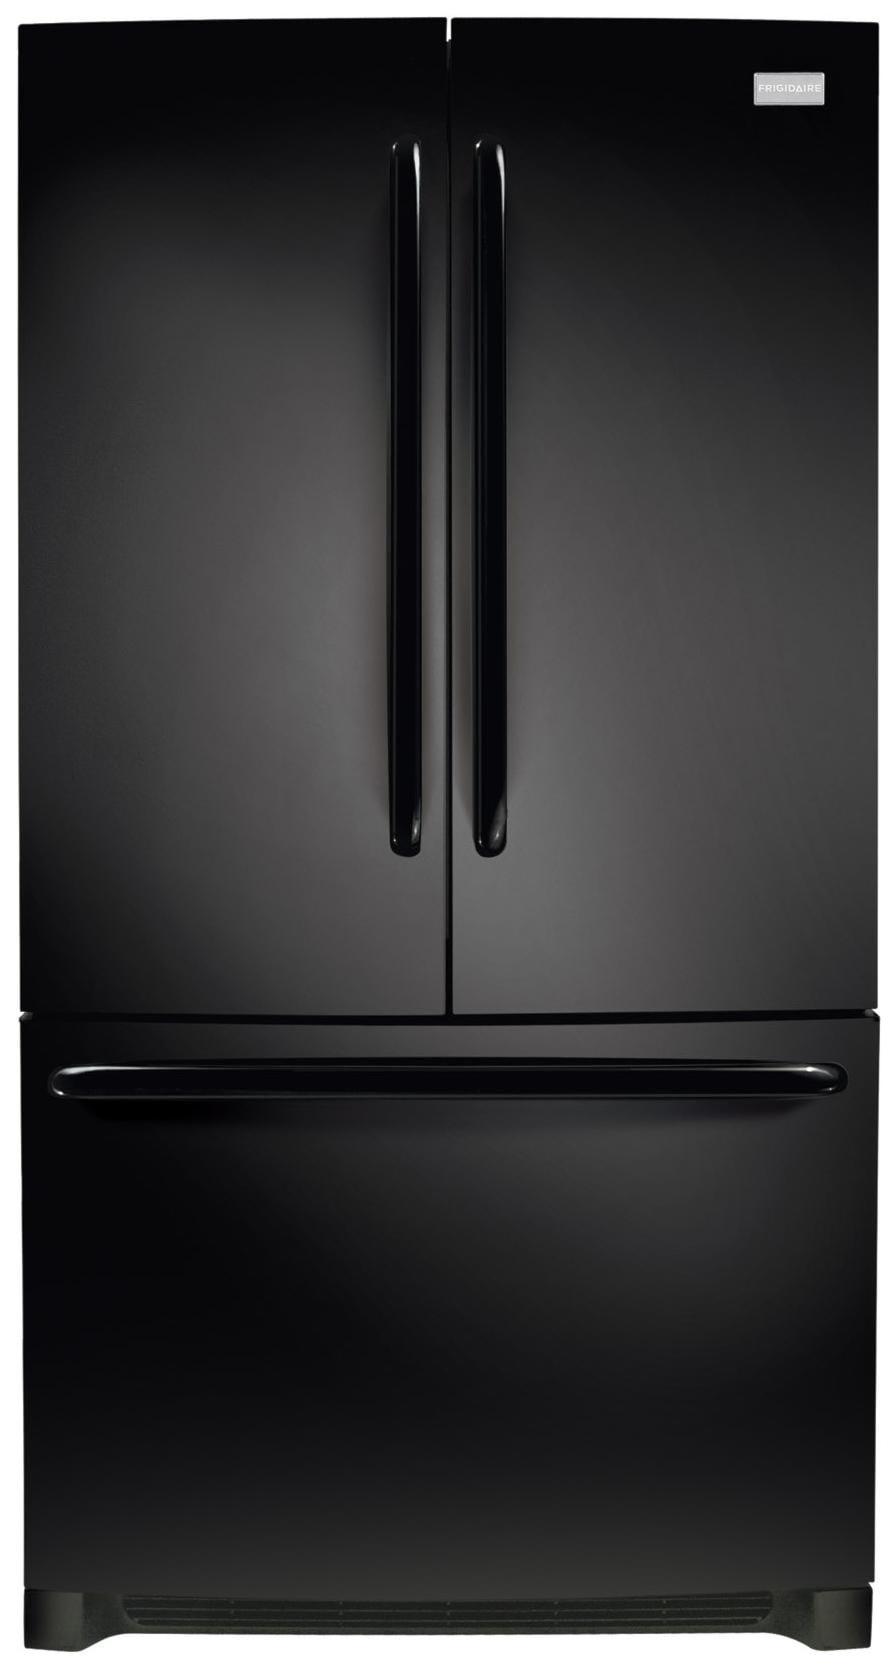 Frigidaire ENERGY STARu00ae 27.8 Cu. Ft. French Door Refrigerator with Adjustable Interior Storage ...